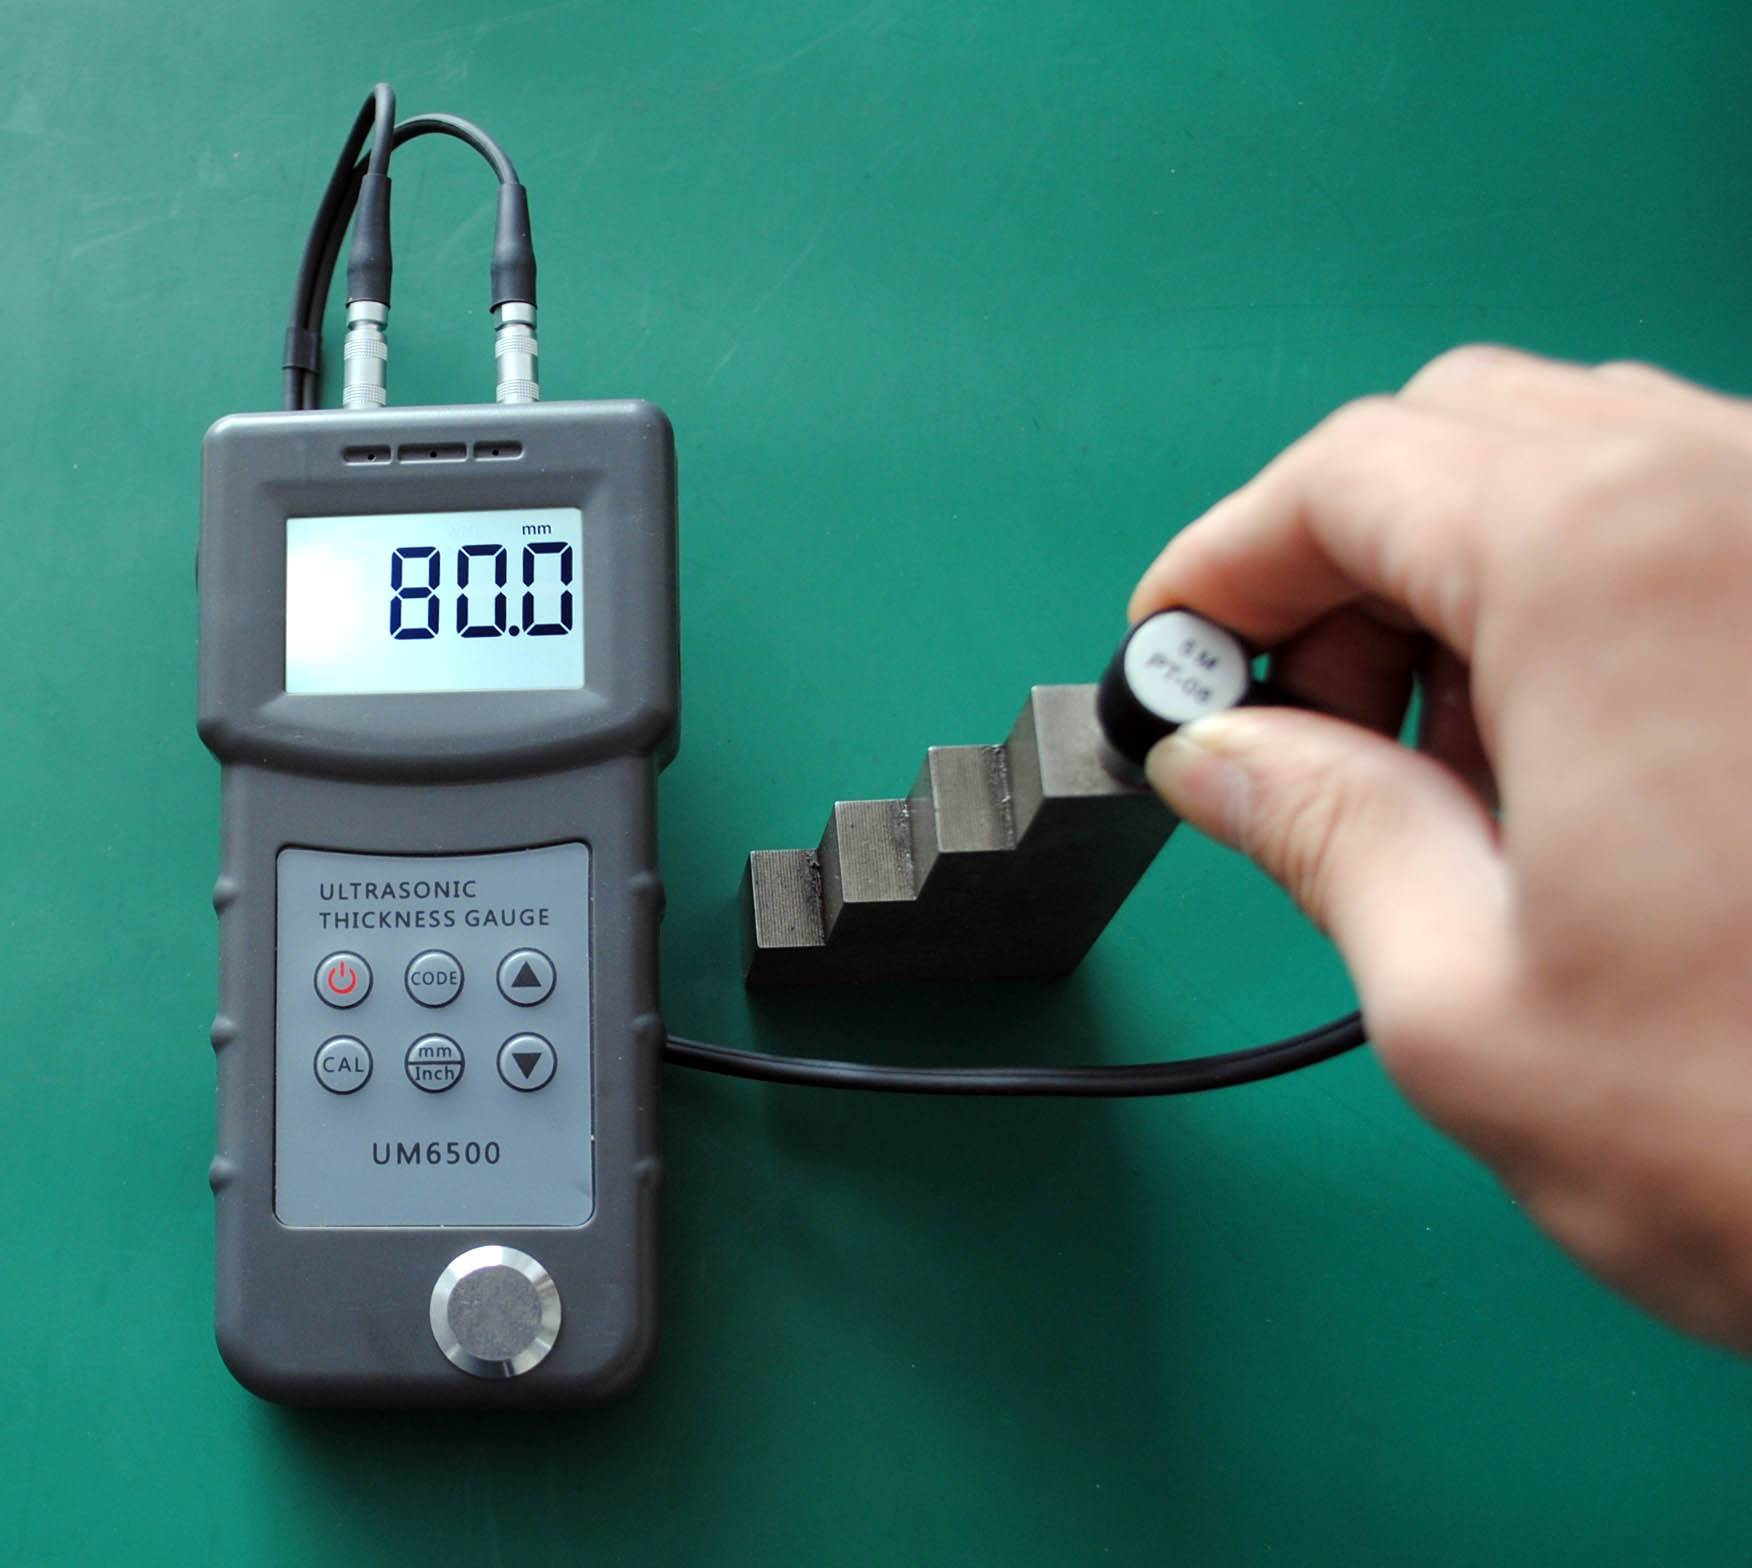 UM6500 Digital Ultrasonic Thickness Gauge